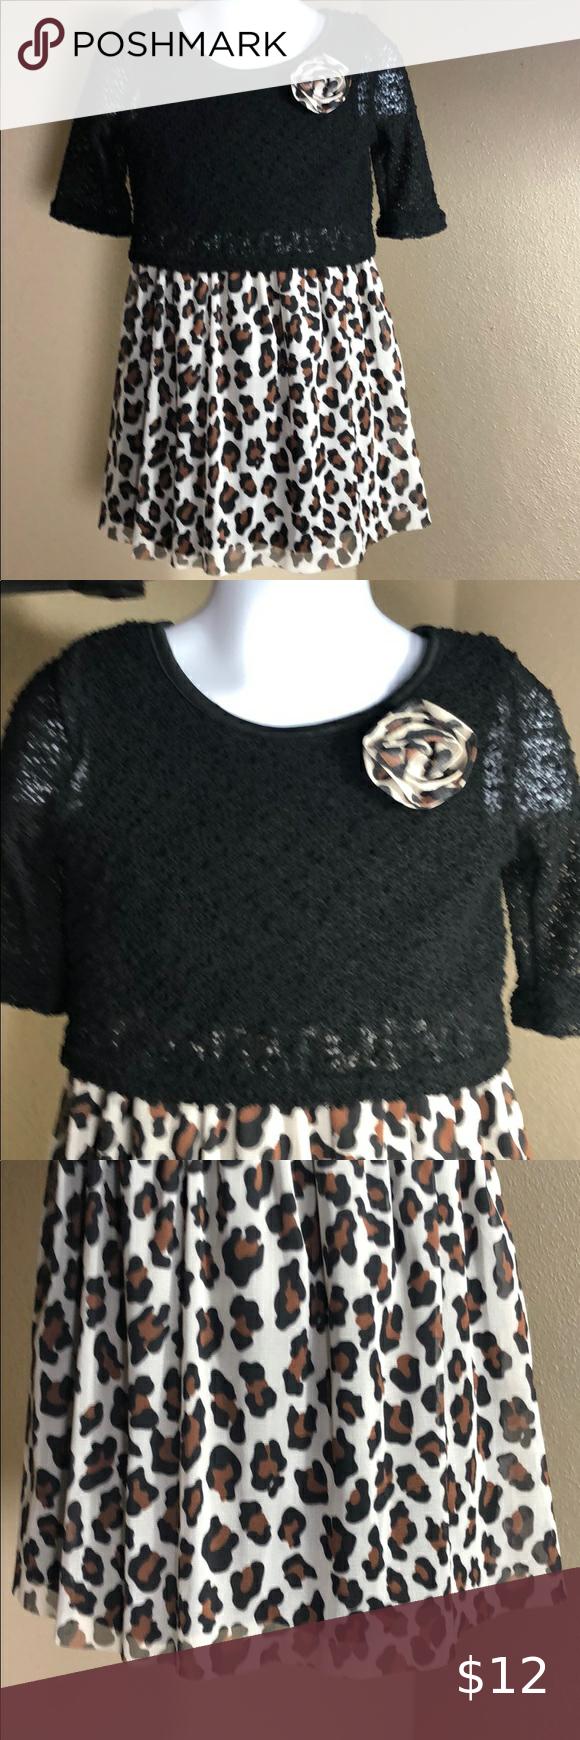 Healthtex Dress 3t 3t Dress Dresses Casual Dresses [ 1740 x 580 Pixel ]